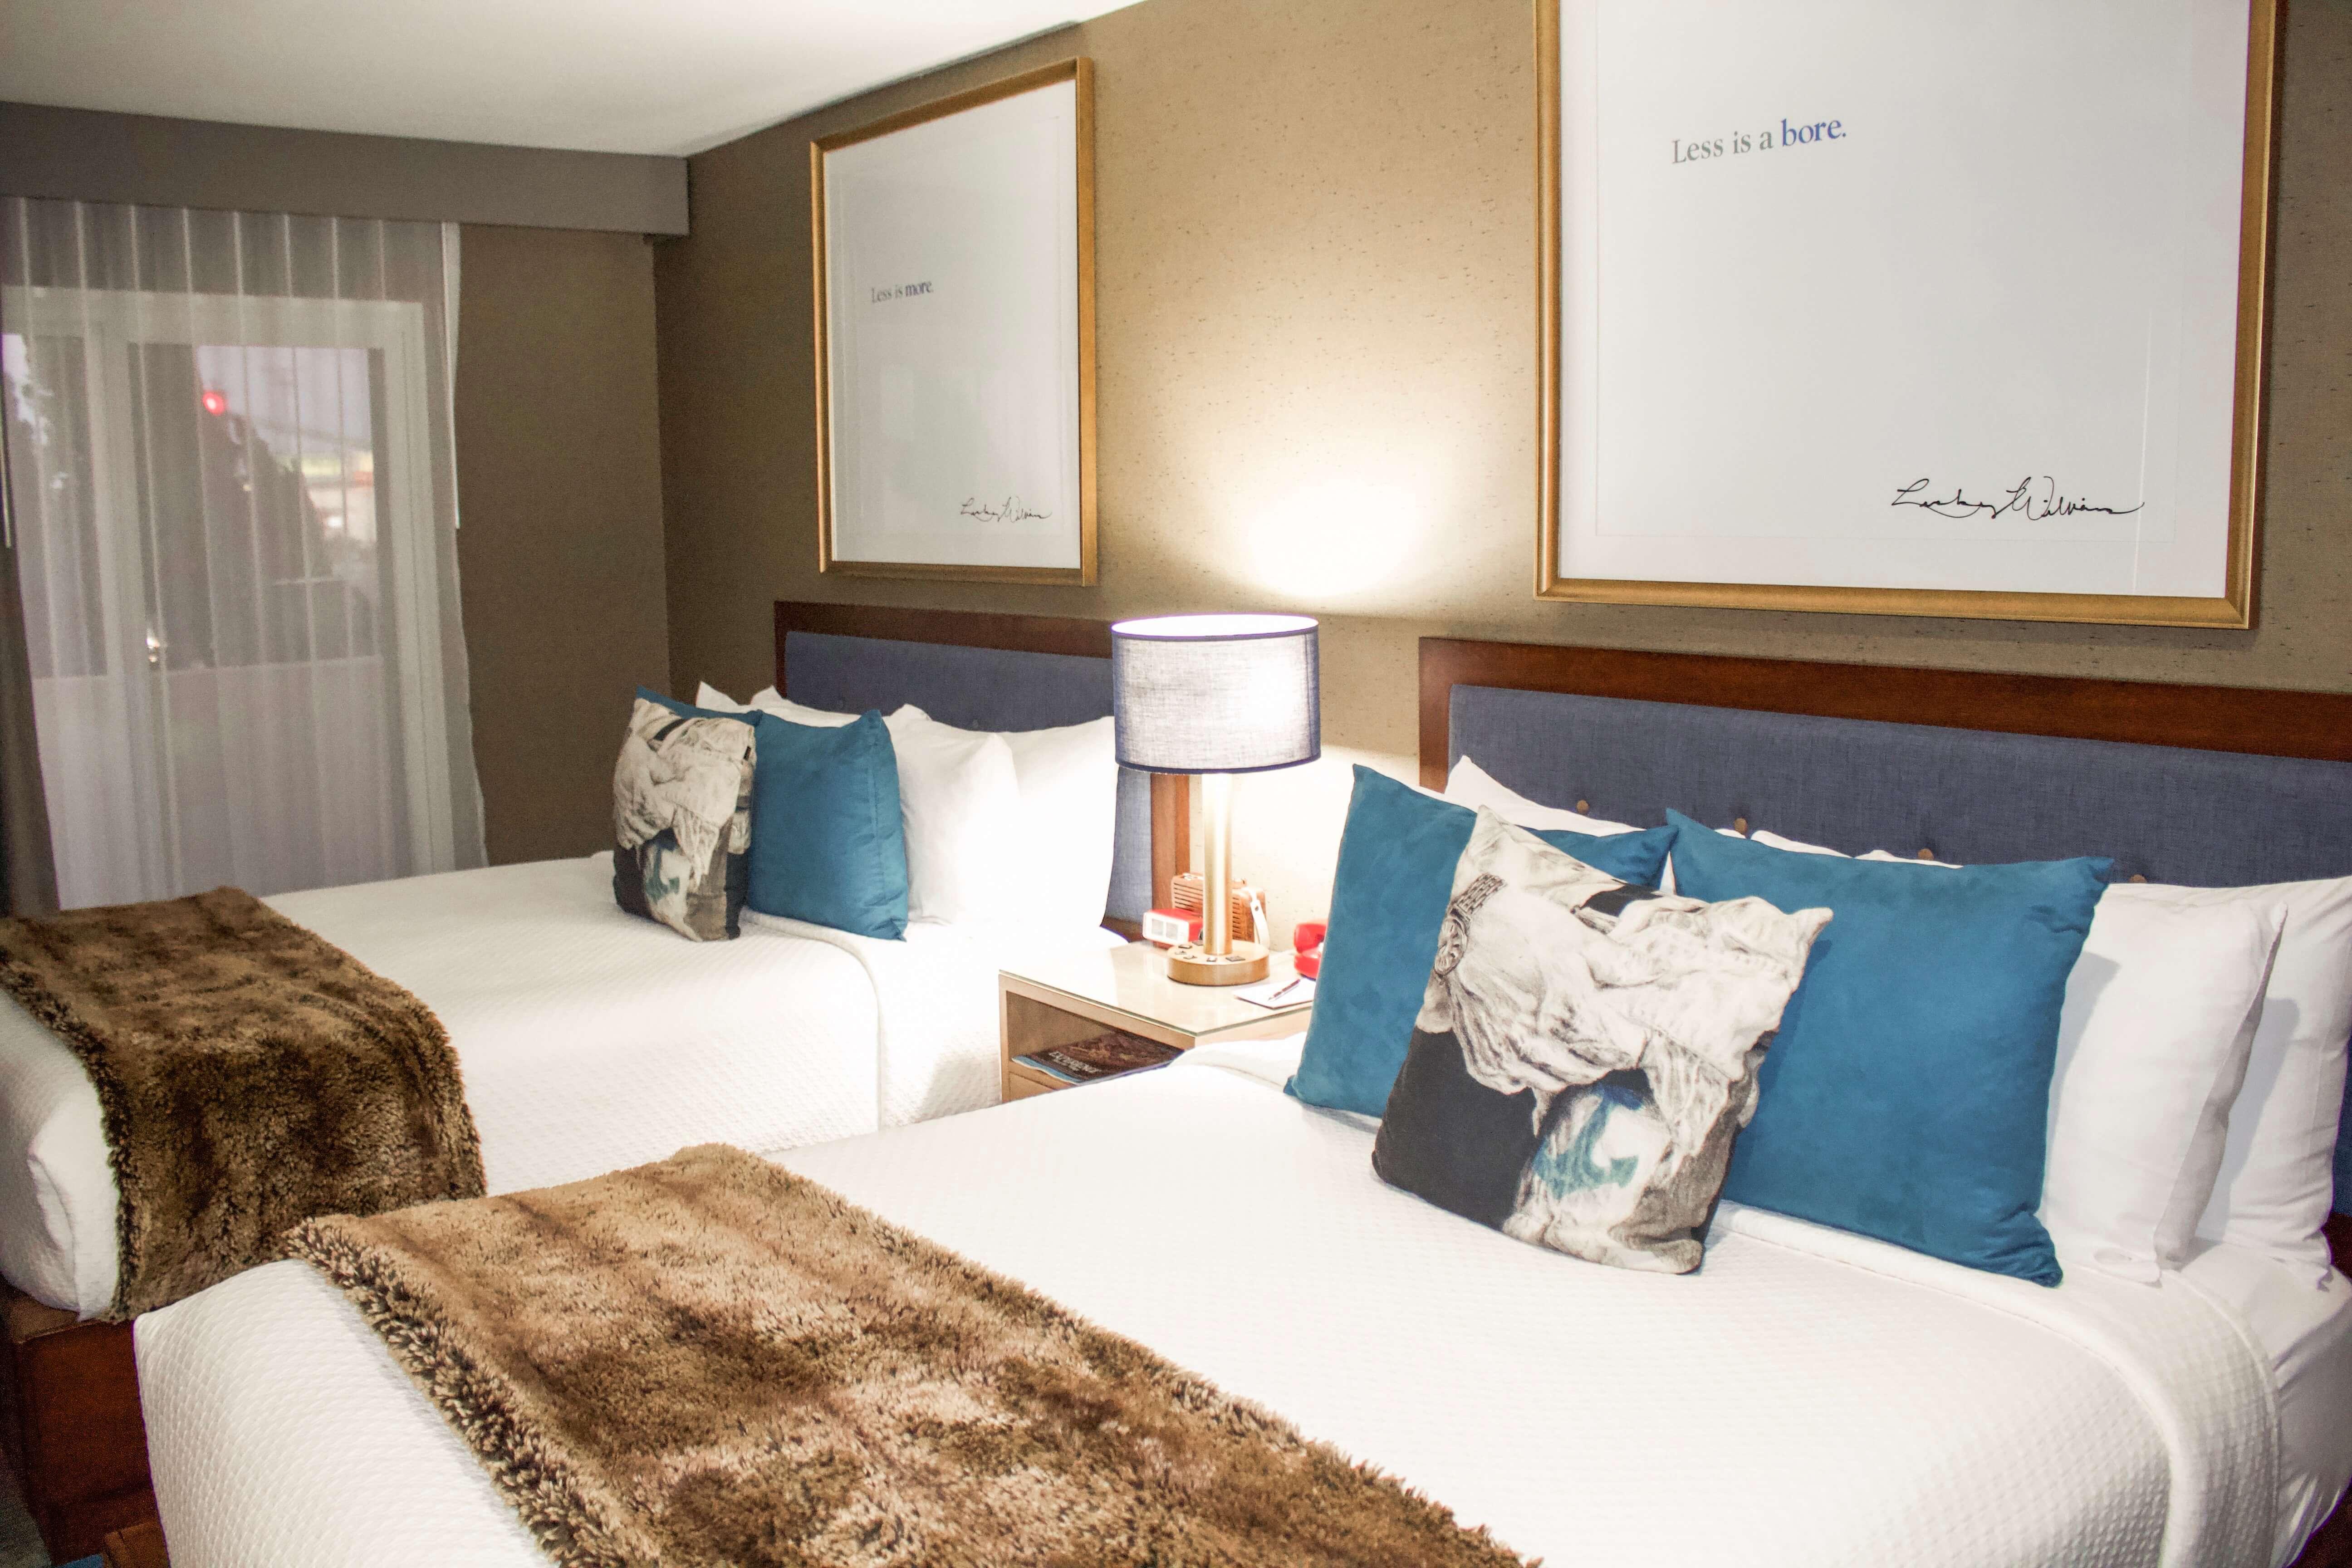 hotel hermosa room